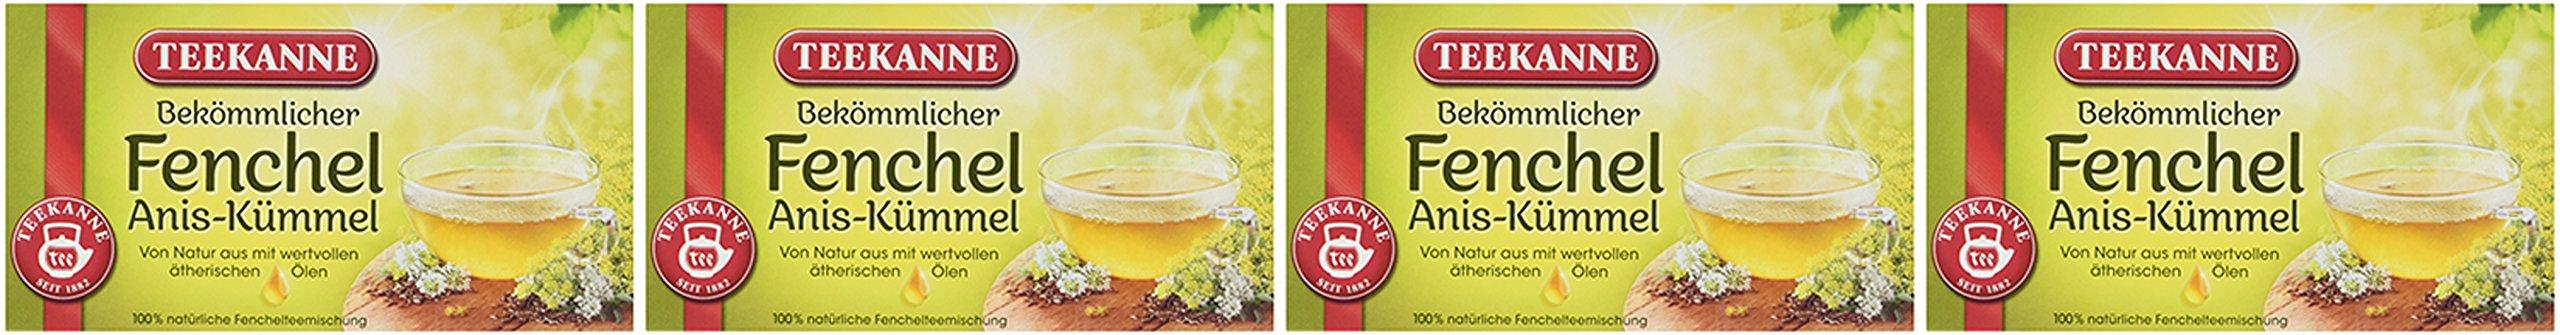 Teekanne-Fenchel-Anis-Kmmel-20-Beutel-4er-Pack-4-x-60-g-Packung